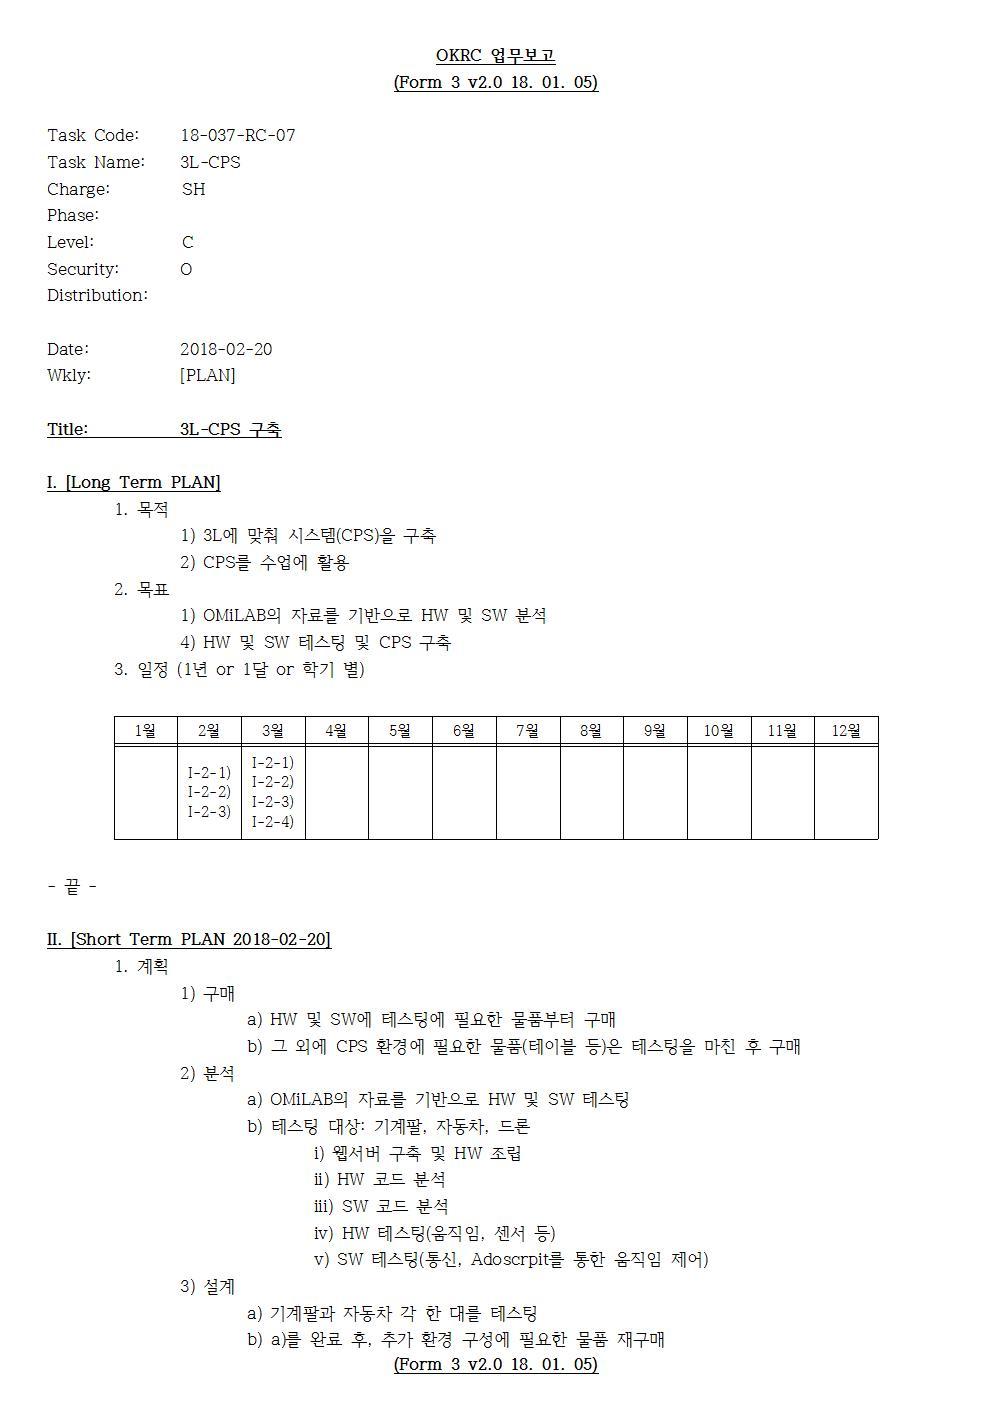 D-[18-037-RC-07]-[3L-CPS]-[2018-02-21][SH]001.jpg